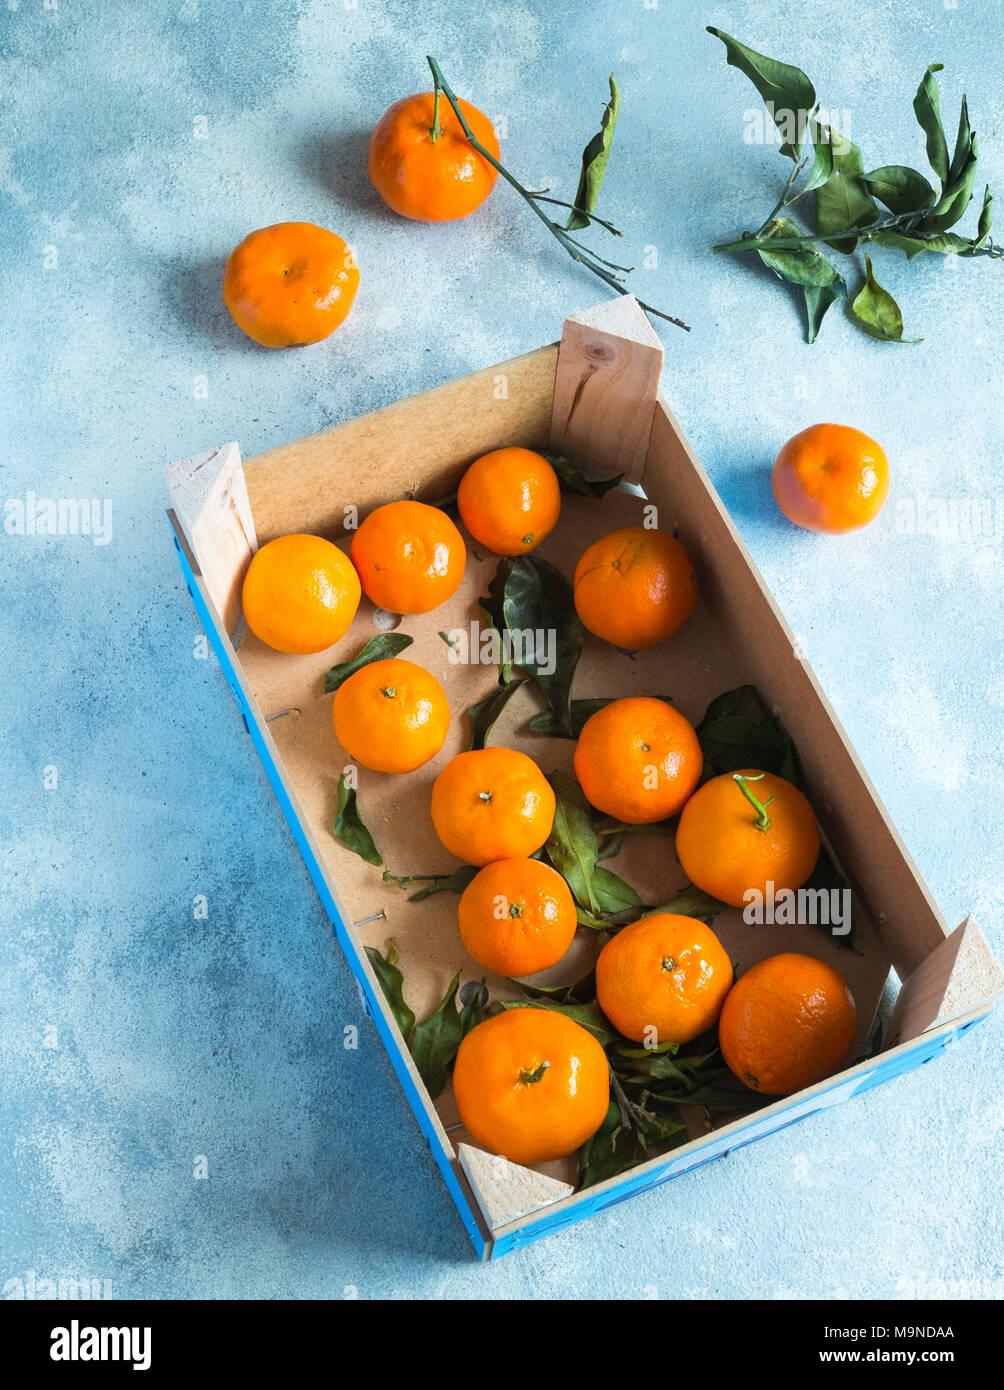 Box of Oranges - Stock Image